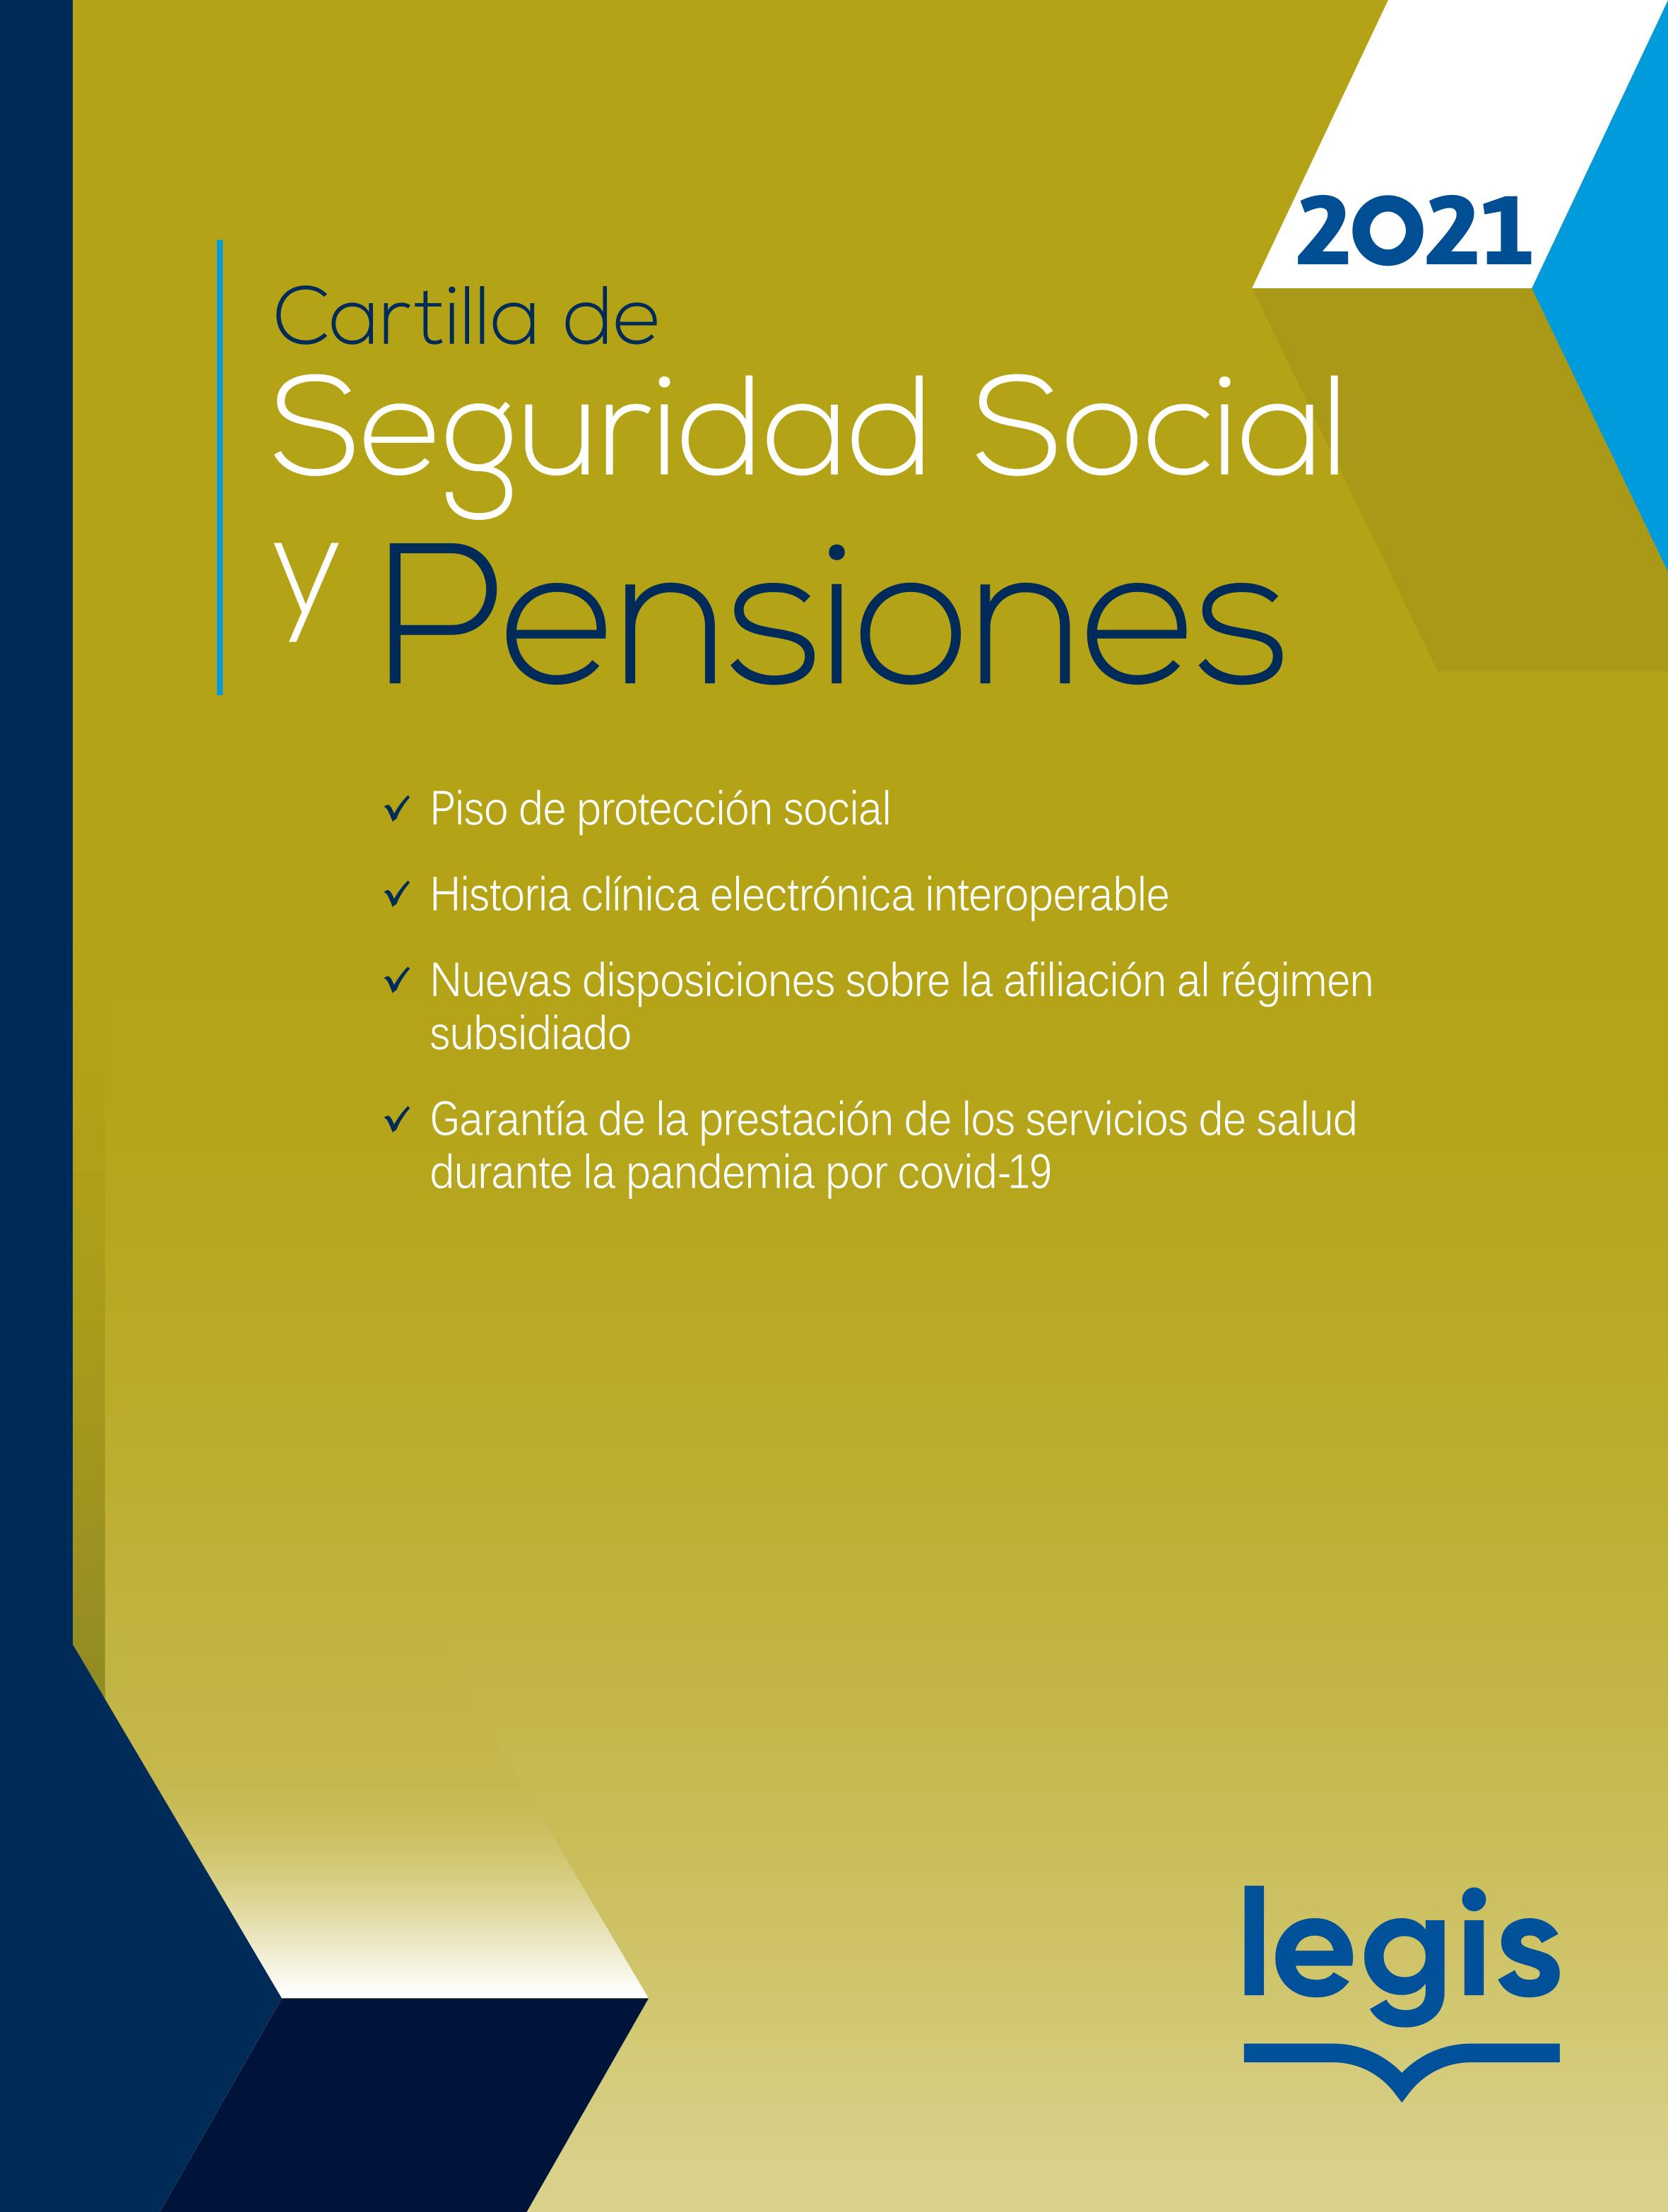 Cartilla de Seguridad Social 28 Ed